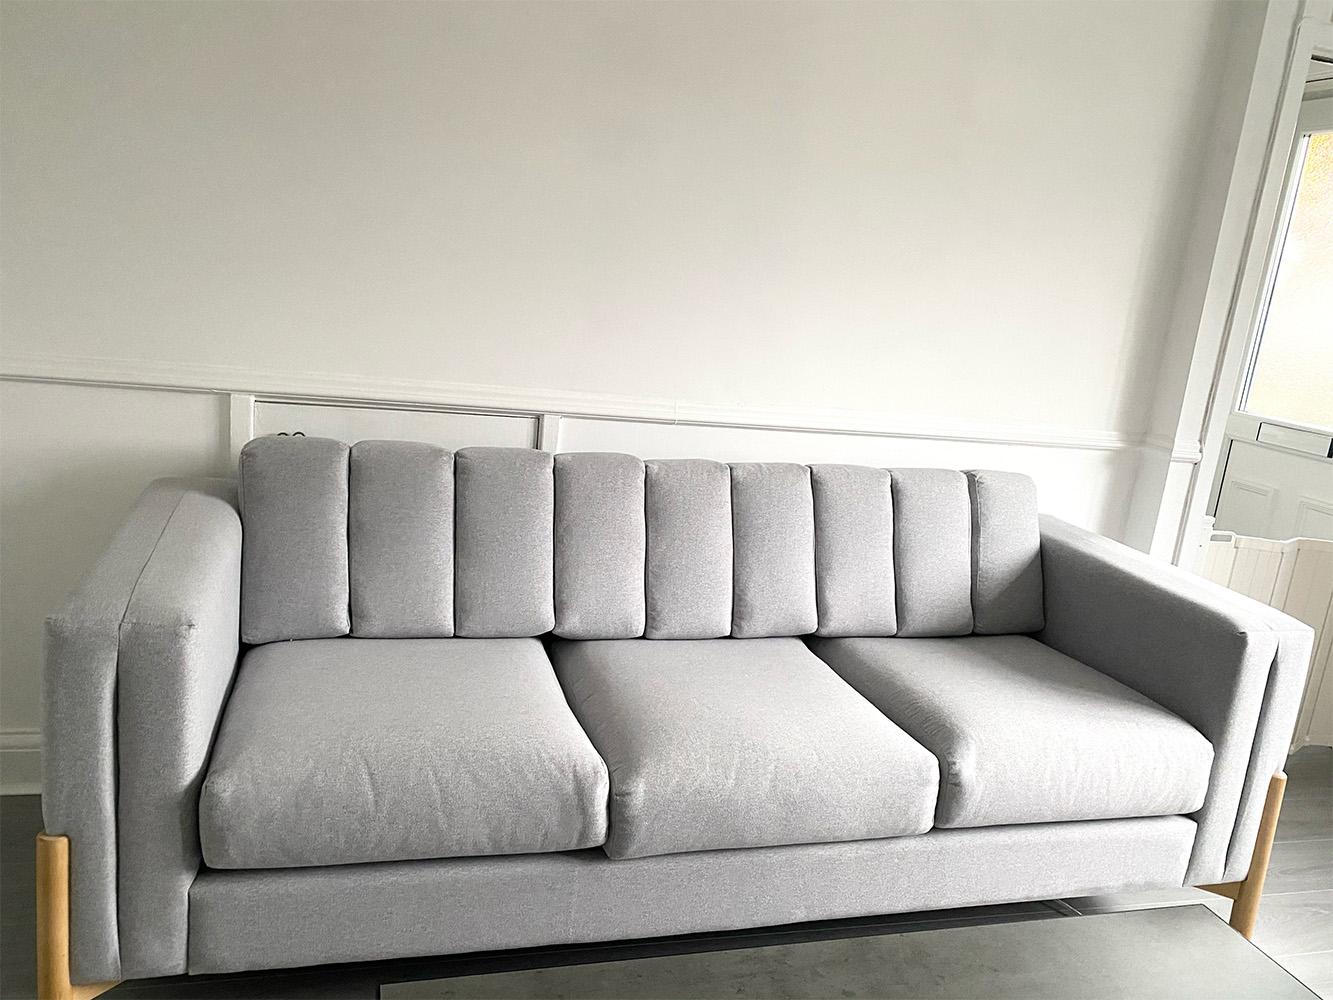 Light grey Scandinavian sofa Cloud with wooden legs